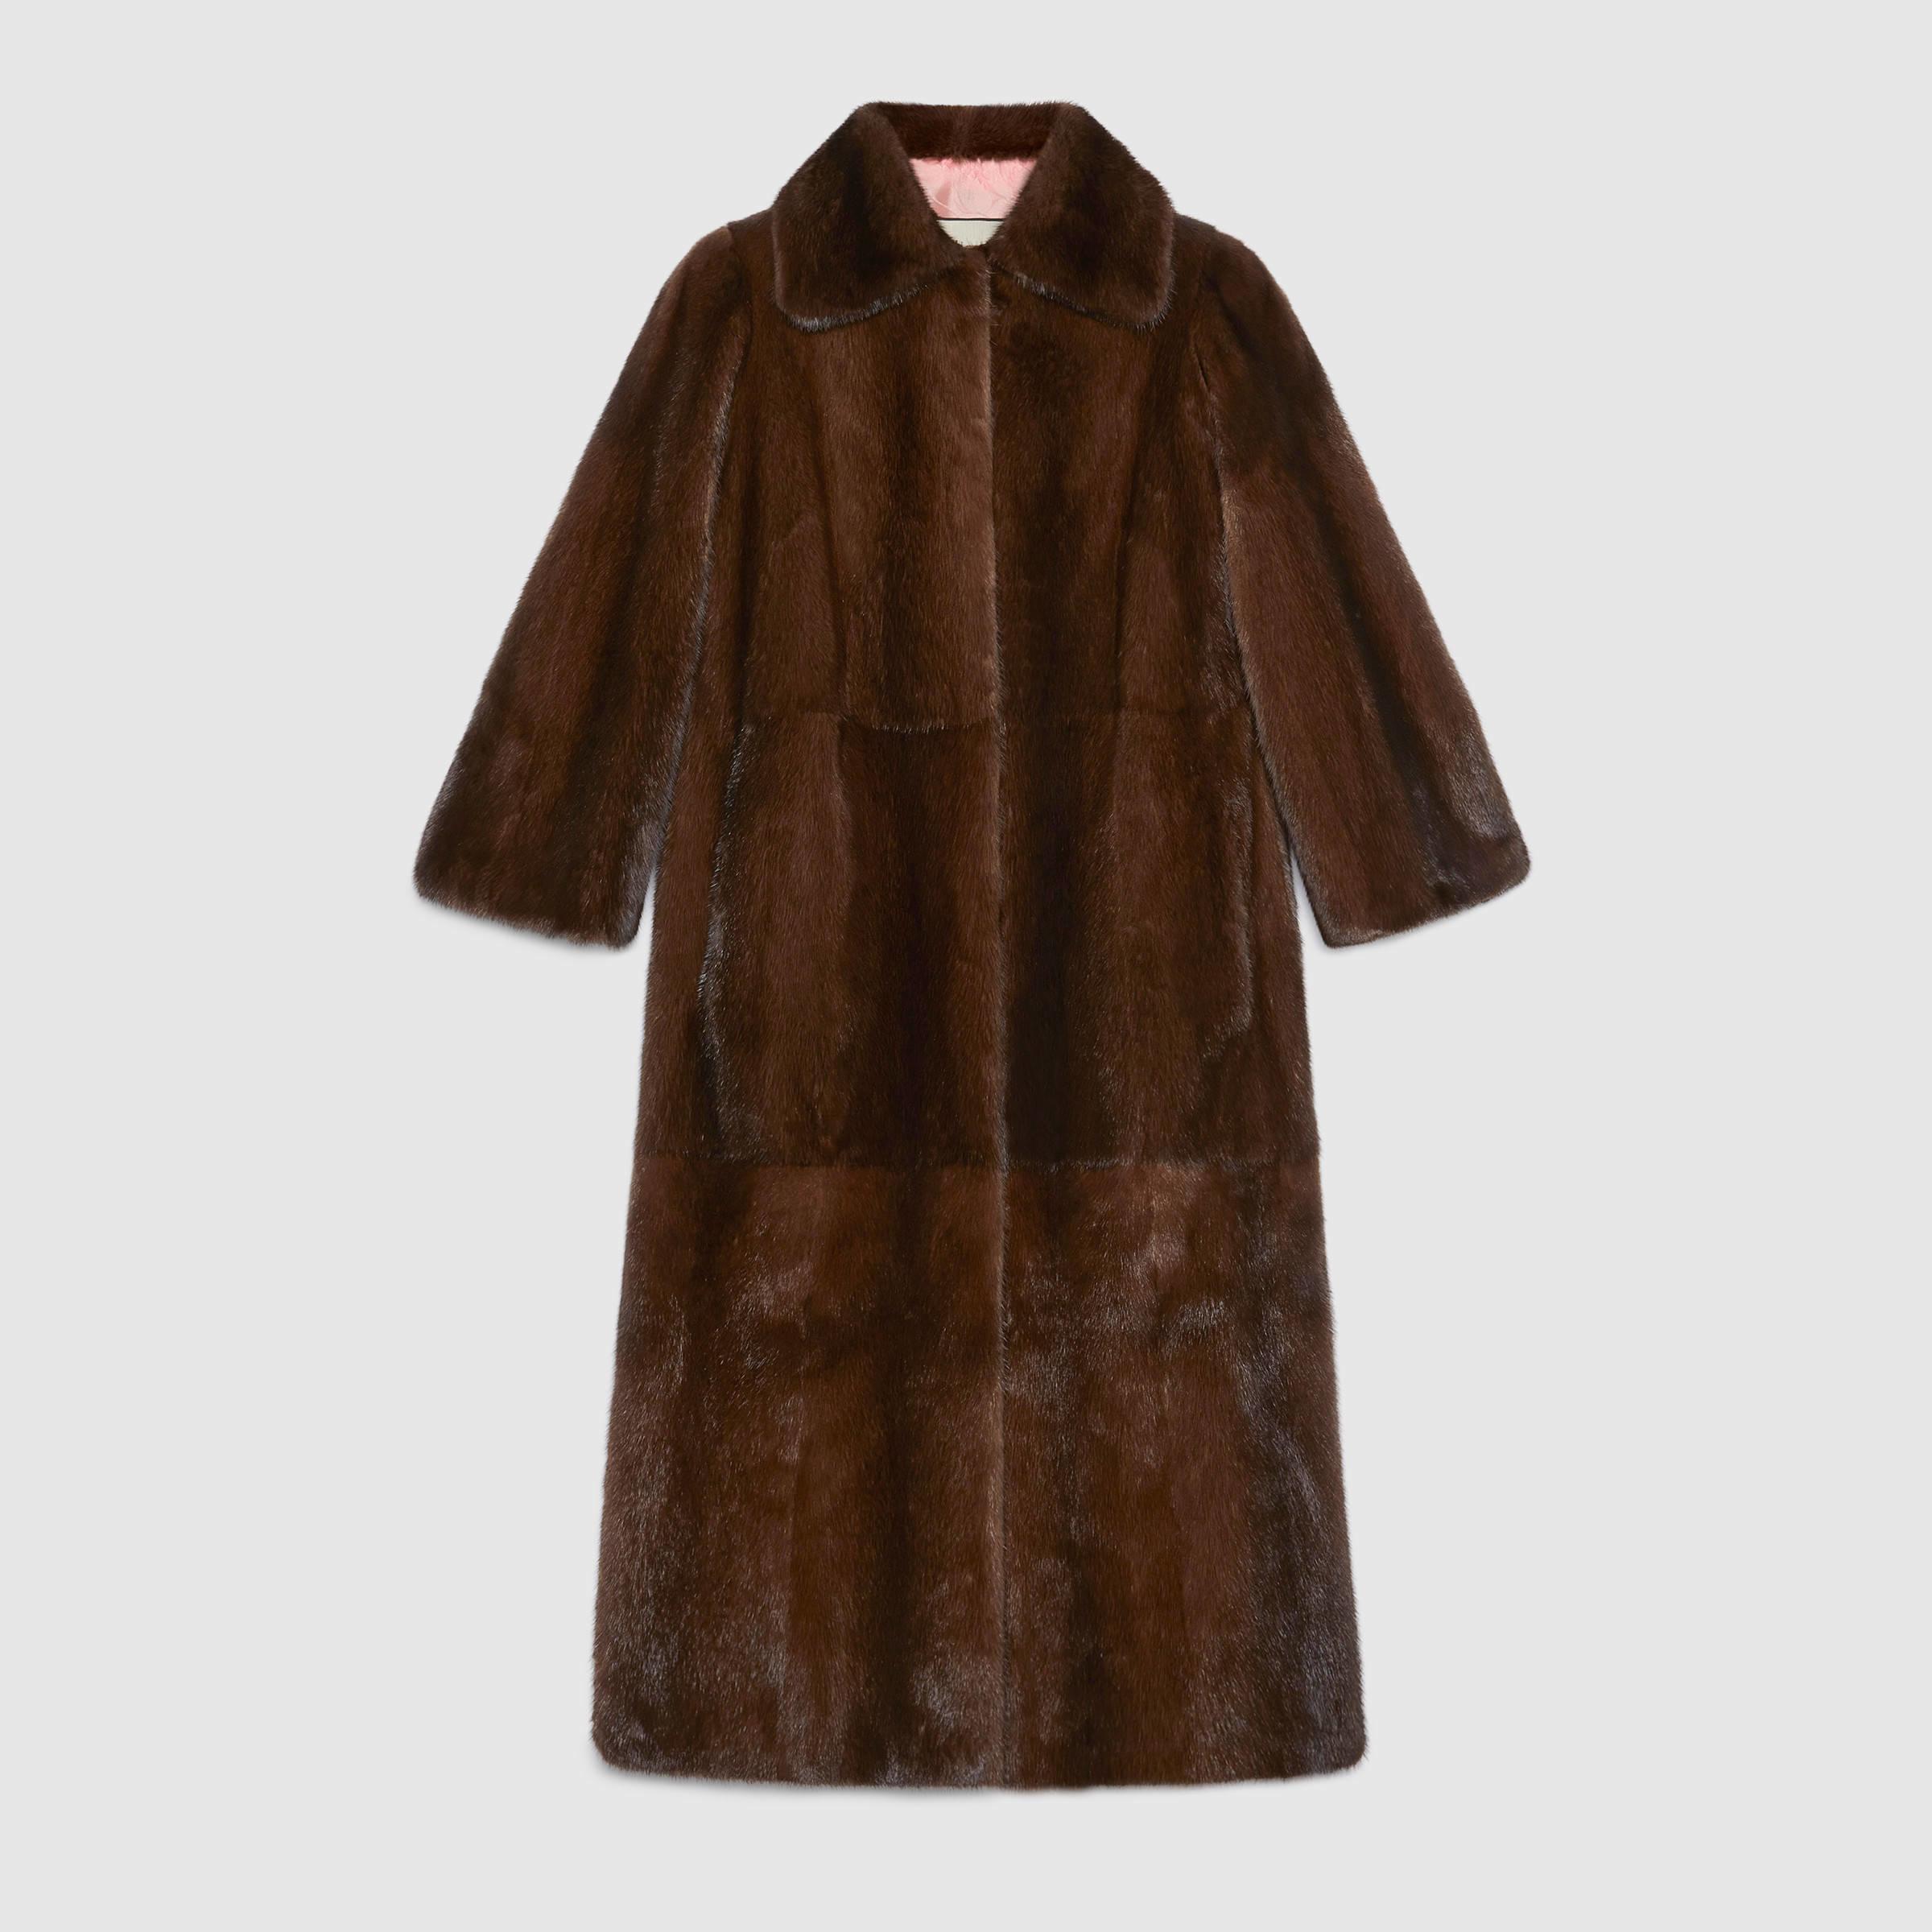 Gucci Tiger Intarsia Mink Coat in Brown